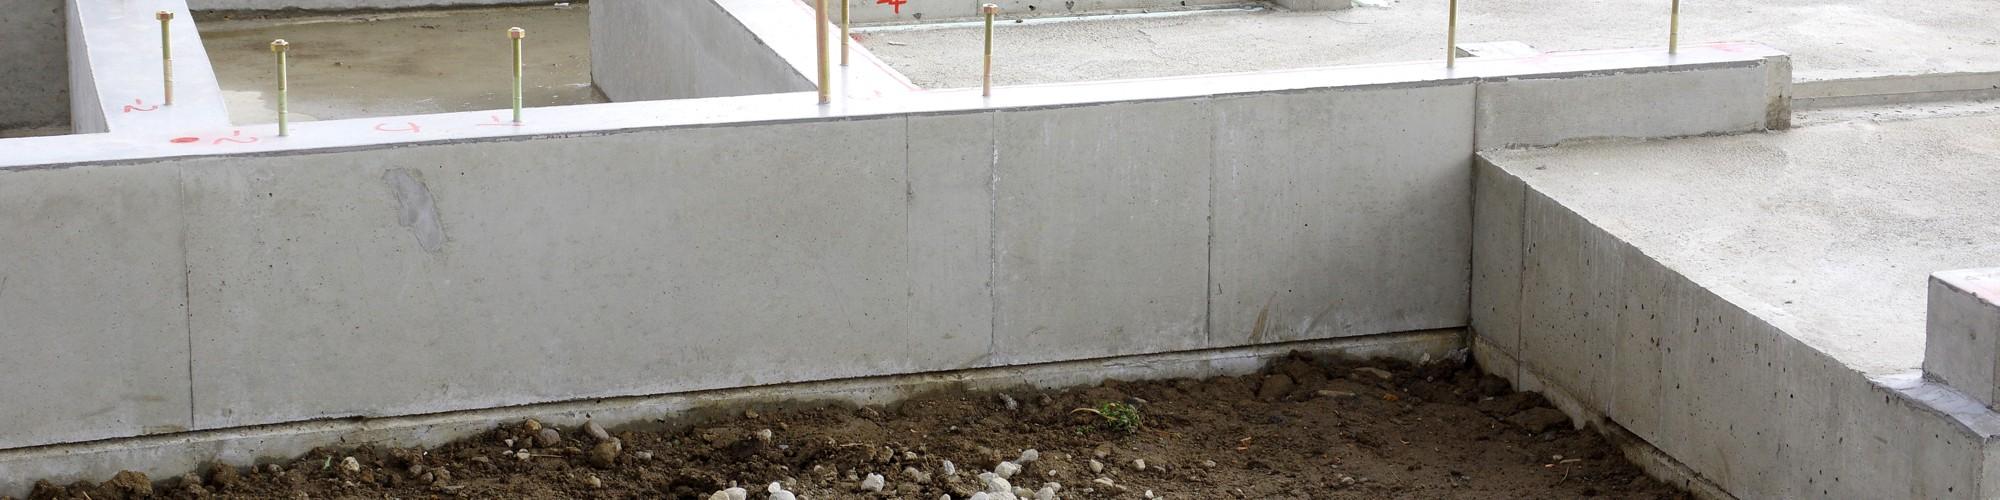 Foto Gründung mit Mauersockel